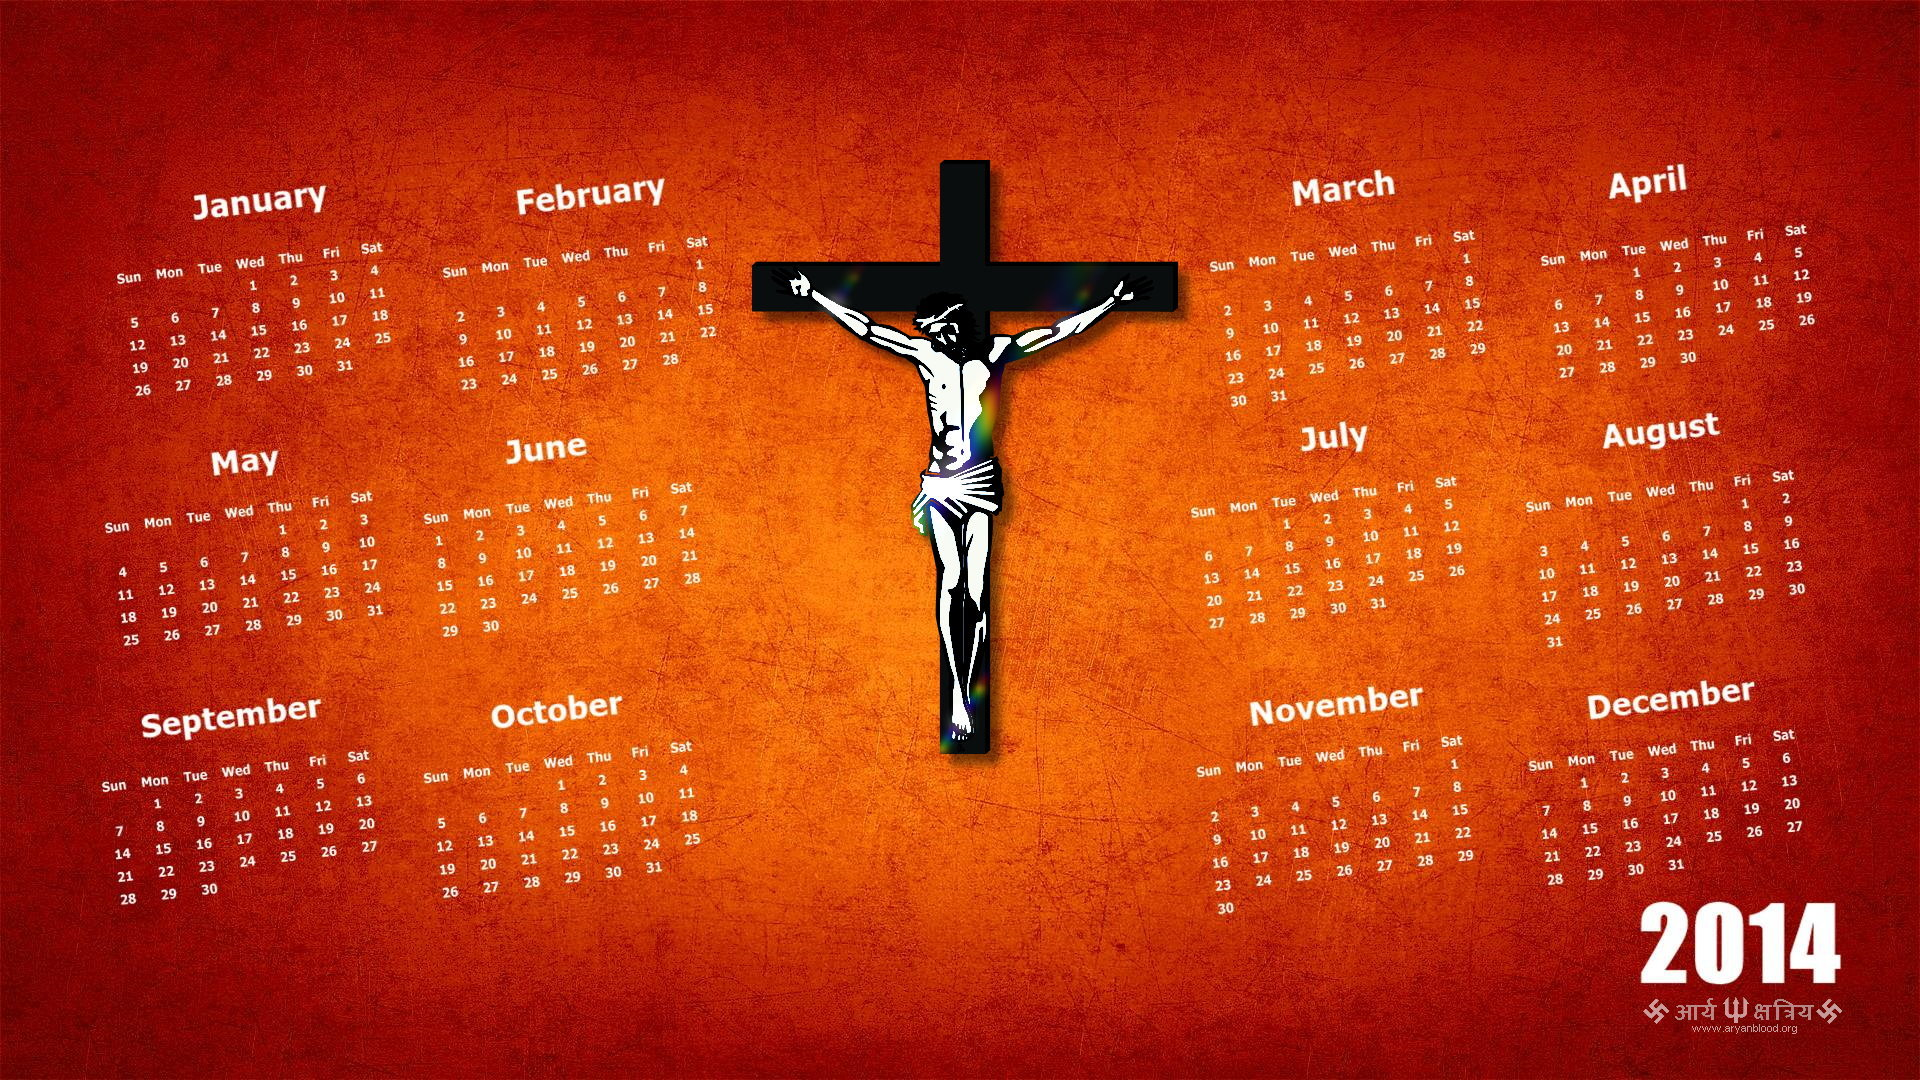 fav 0 rate 2 tweet 1920x1080 religion calendar jesus christianity 1920x1080